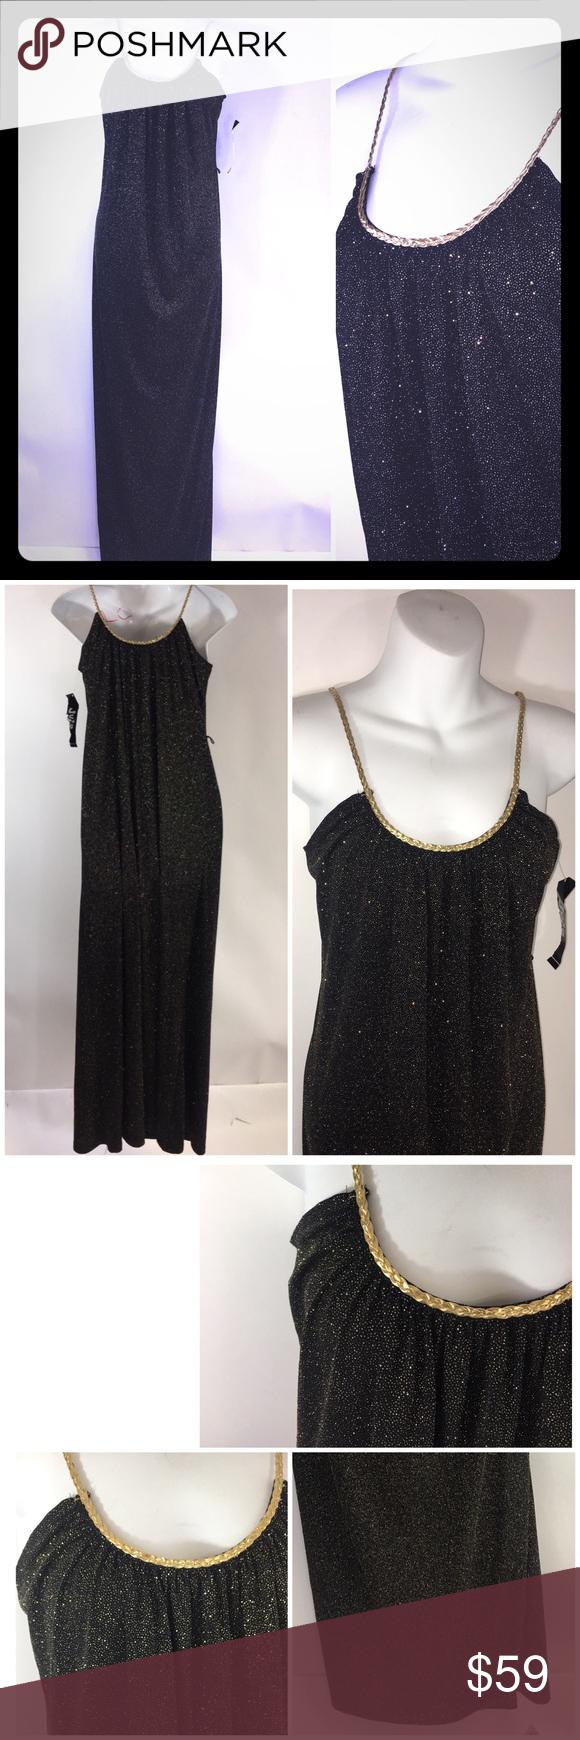 Jump Blk Gold Sleeveless Maxi Dress 1 2 New Nwt Maxi Dress Party Gold Maxi Dress Vegas Dresses